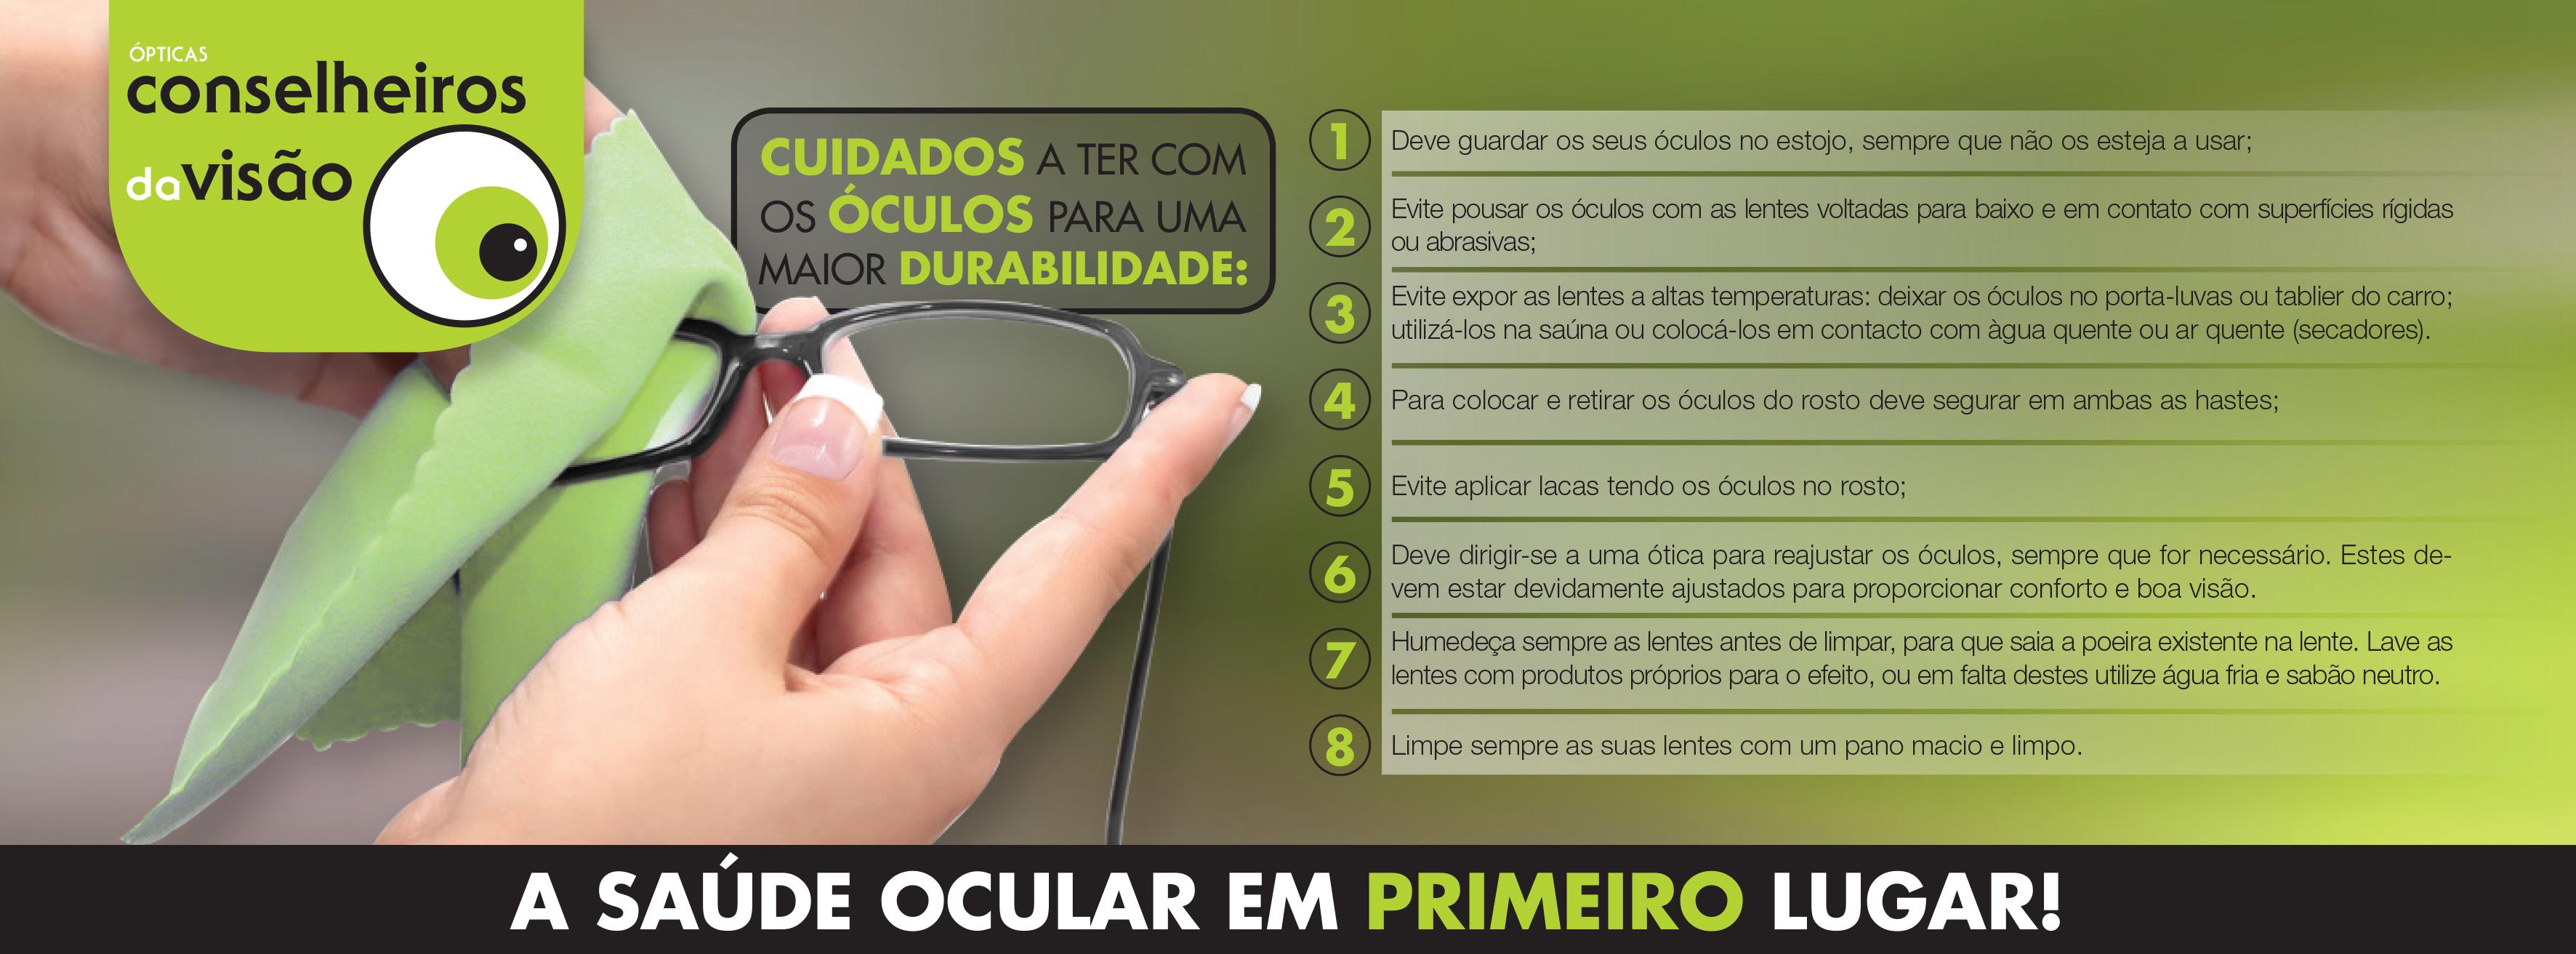 DICA_FACE_cuidados_oculos_v1